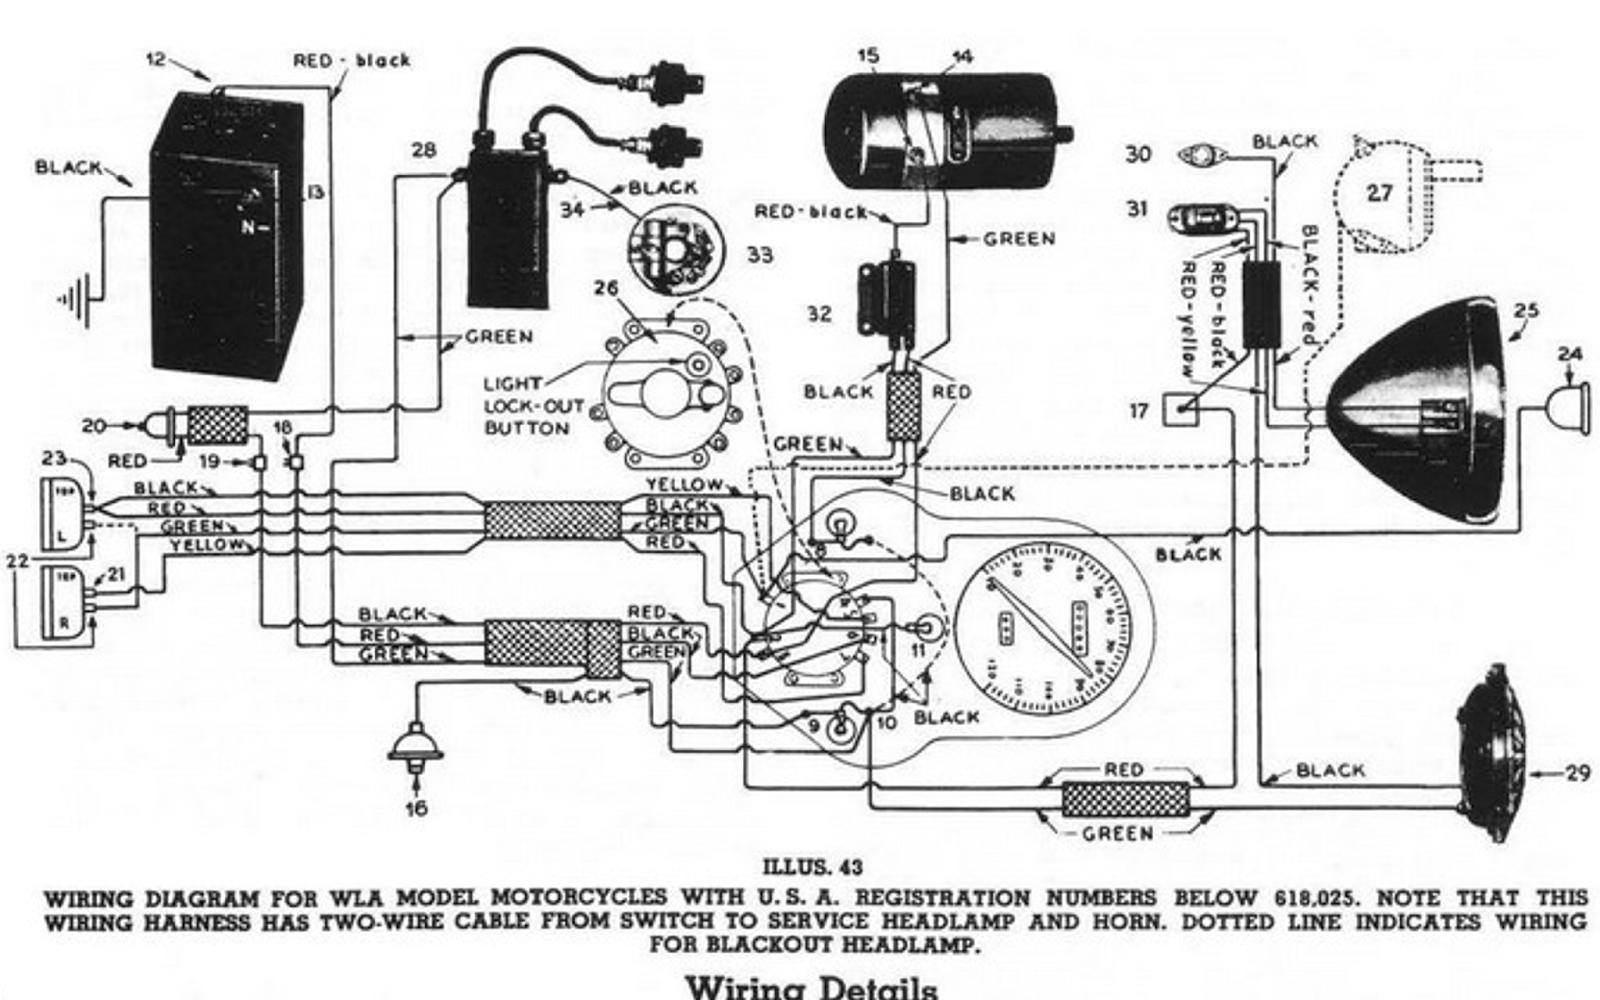 1941 Harley Davidson WL Restoration : Re-Wiring the Harley ...